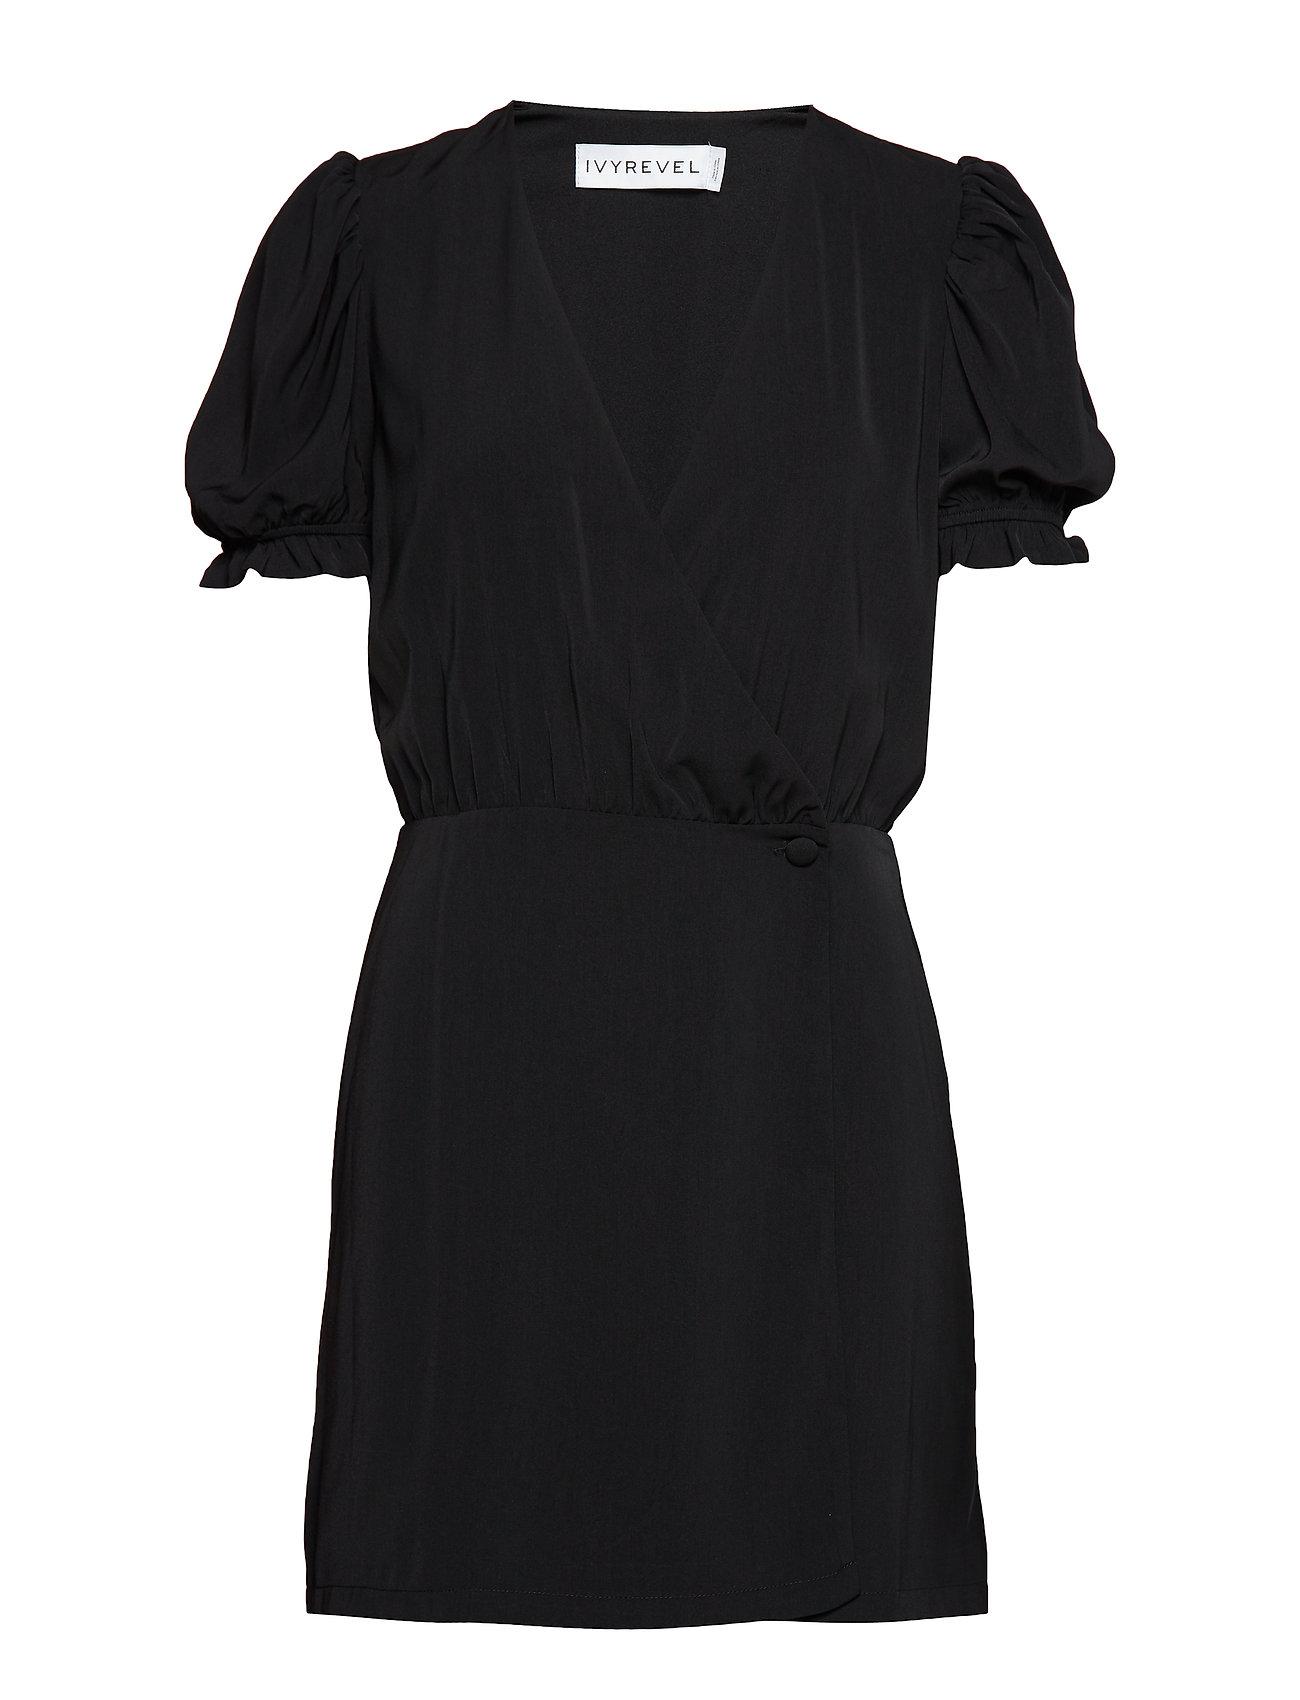 Ivyrevel Puff Sleeve Overlap Dress - BLACK